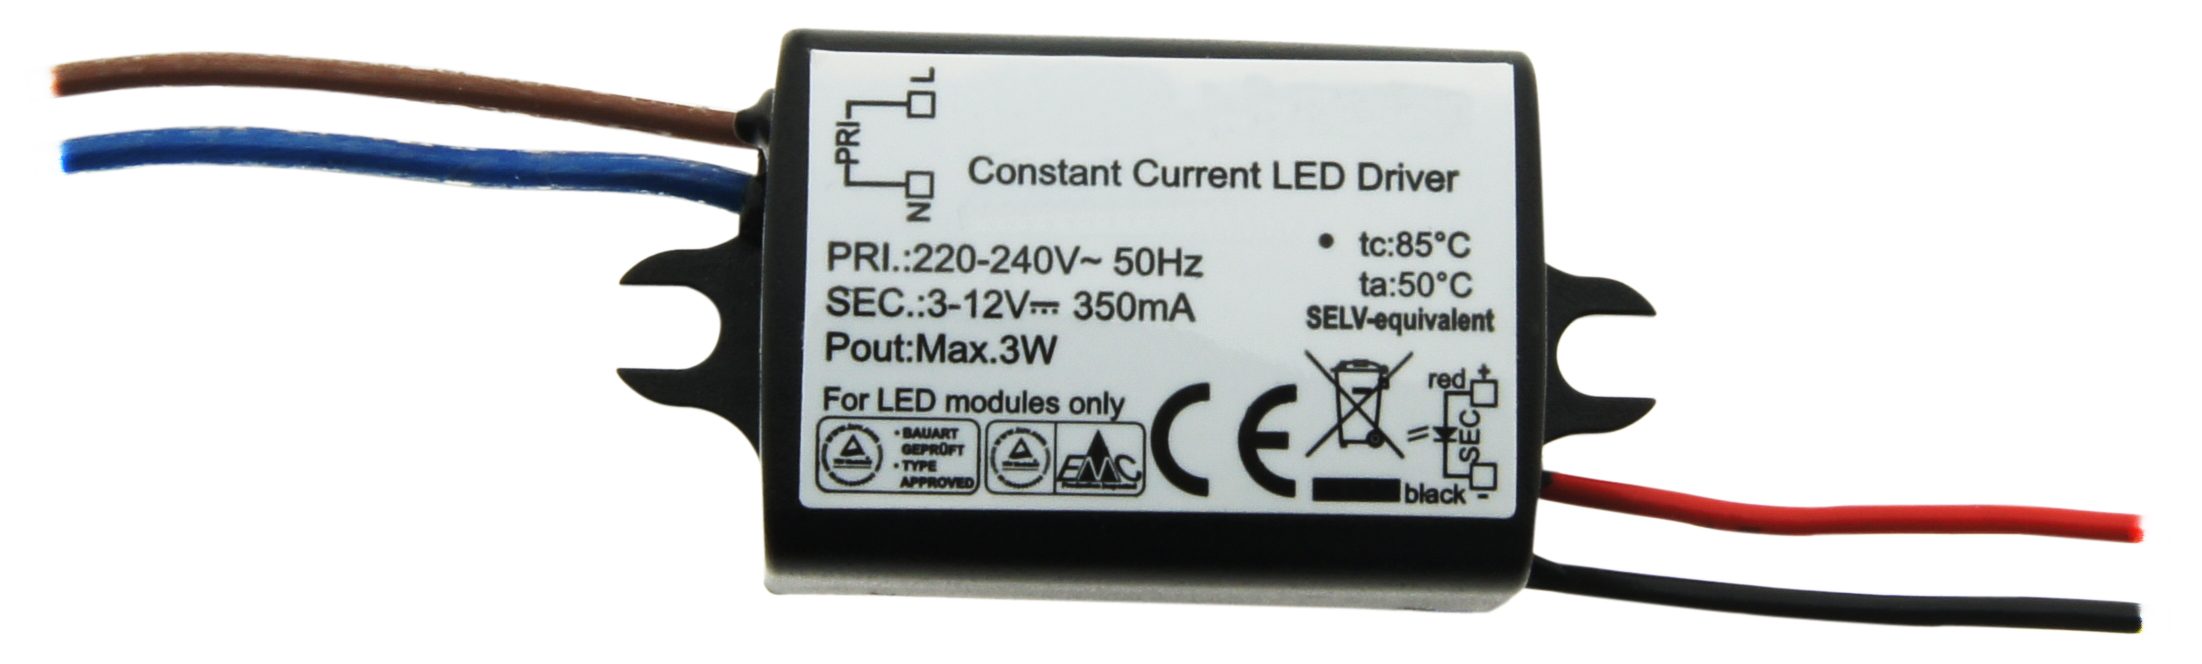 LED Netzteil HW 3W/500mA, Mini, IP65